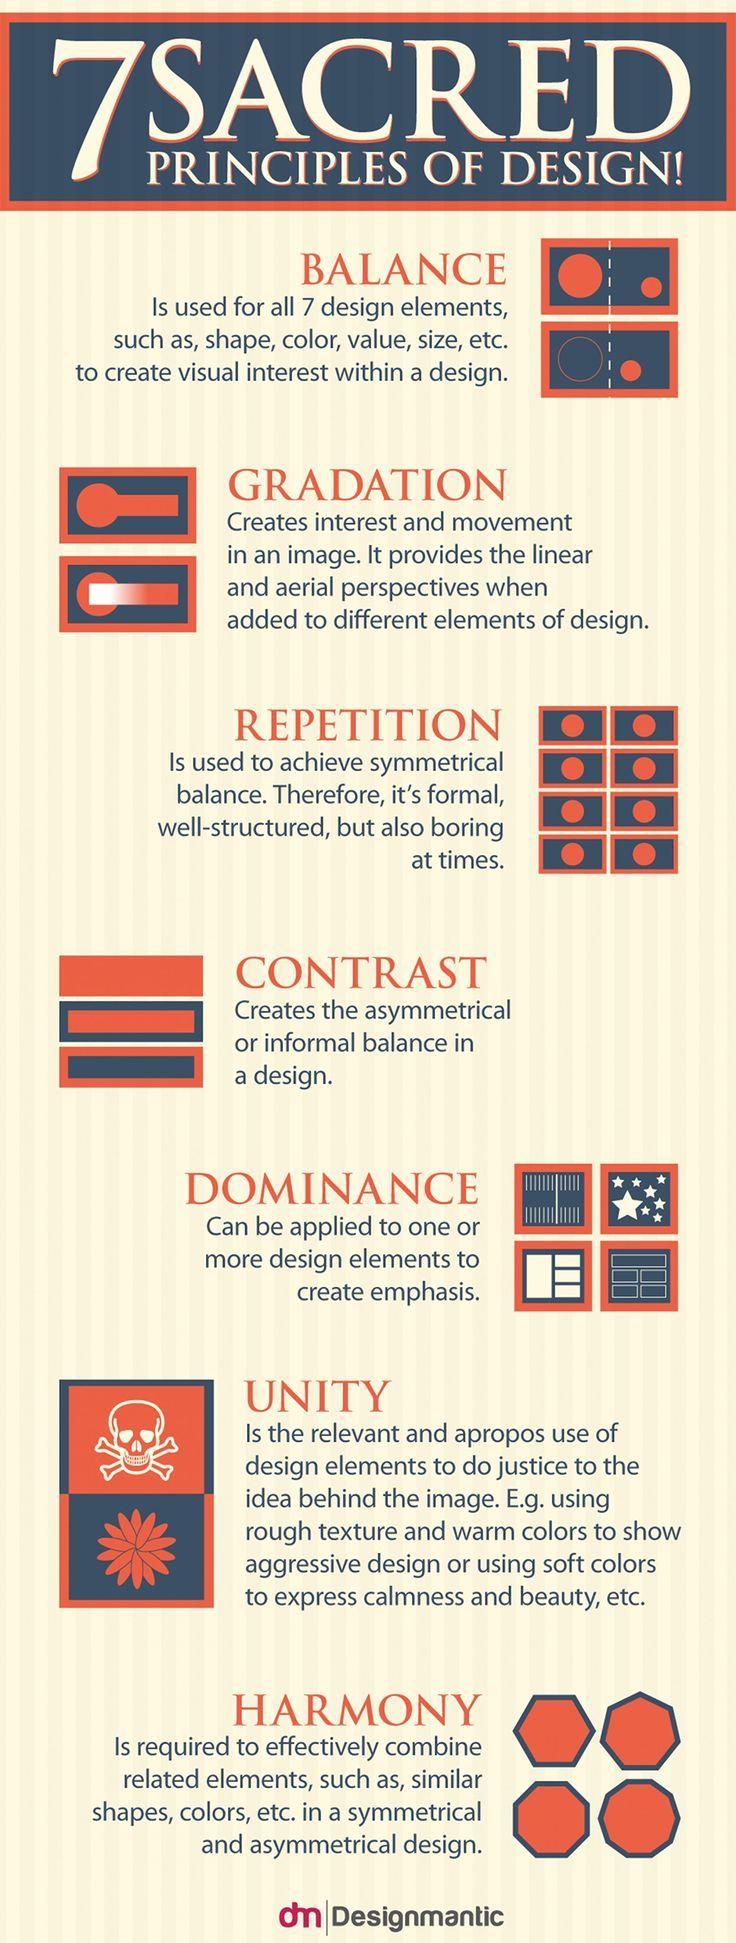 Web Design Basics 7 Sacred Principles Of Design To Follow Infographic Design Basics Principles Of Design Web Design Quotes